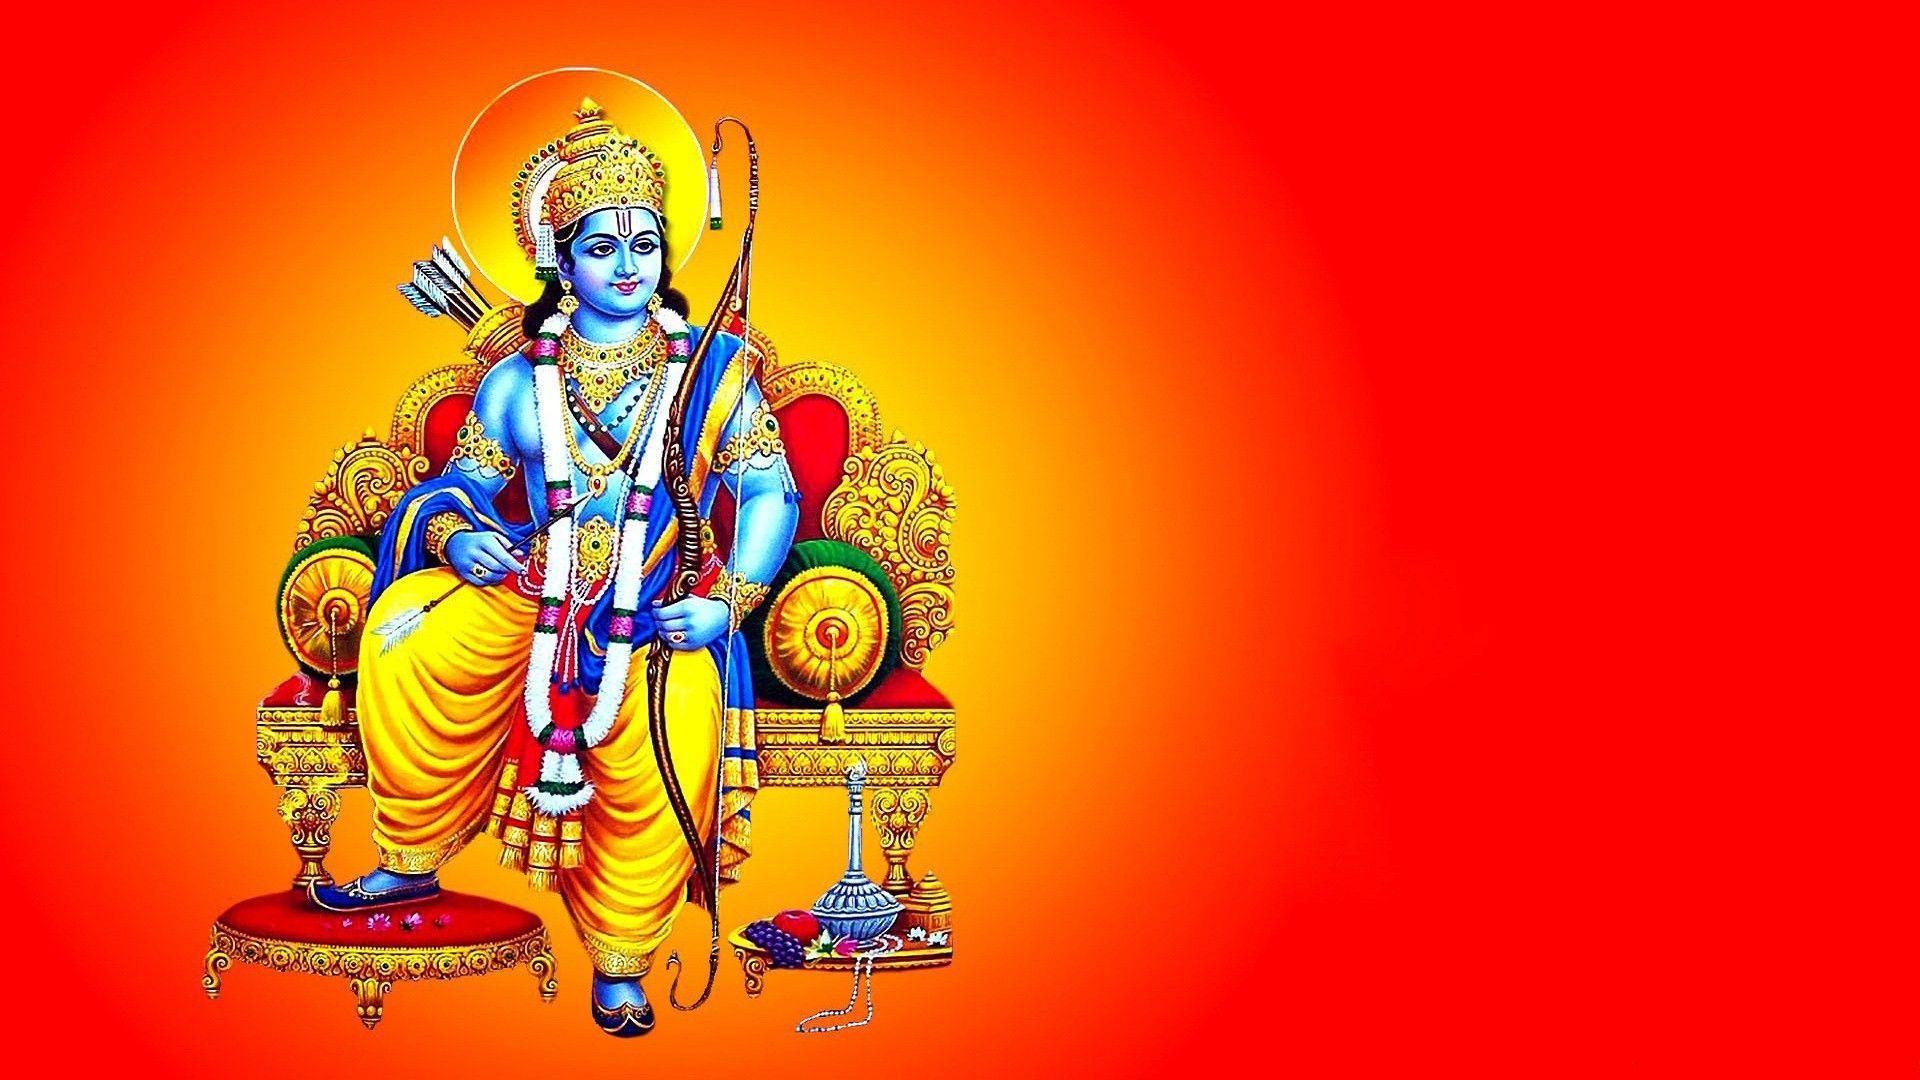 Hindu Gods And Goddesses Lord Rama Ram Navami Images Happy Ram Navami Hindu Gods